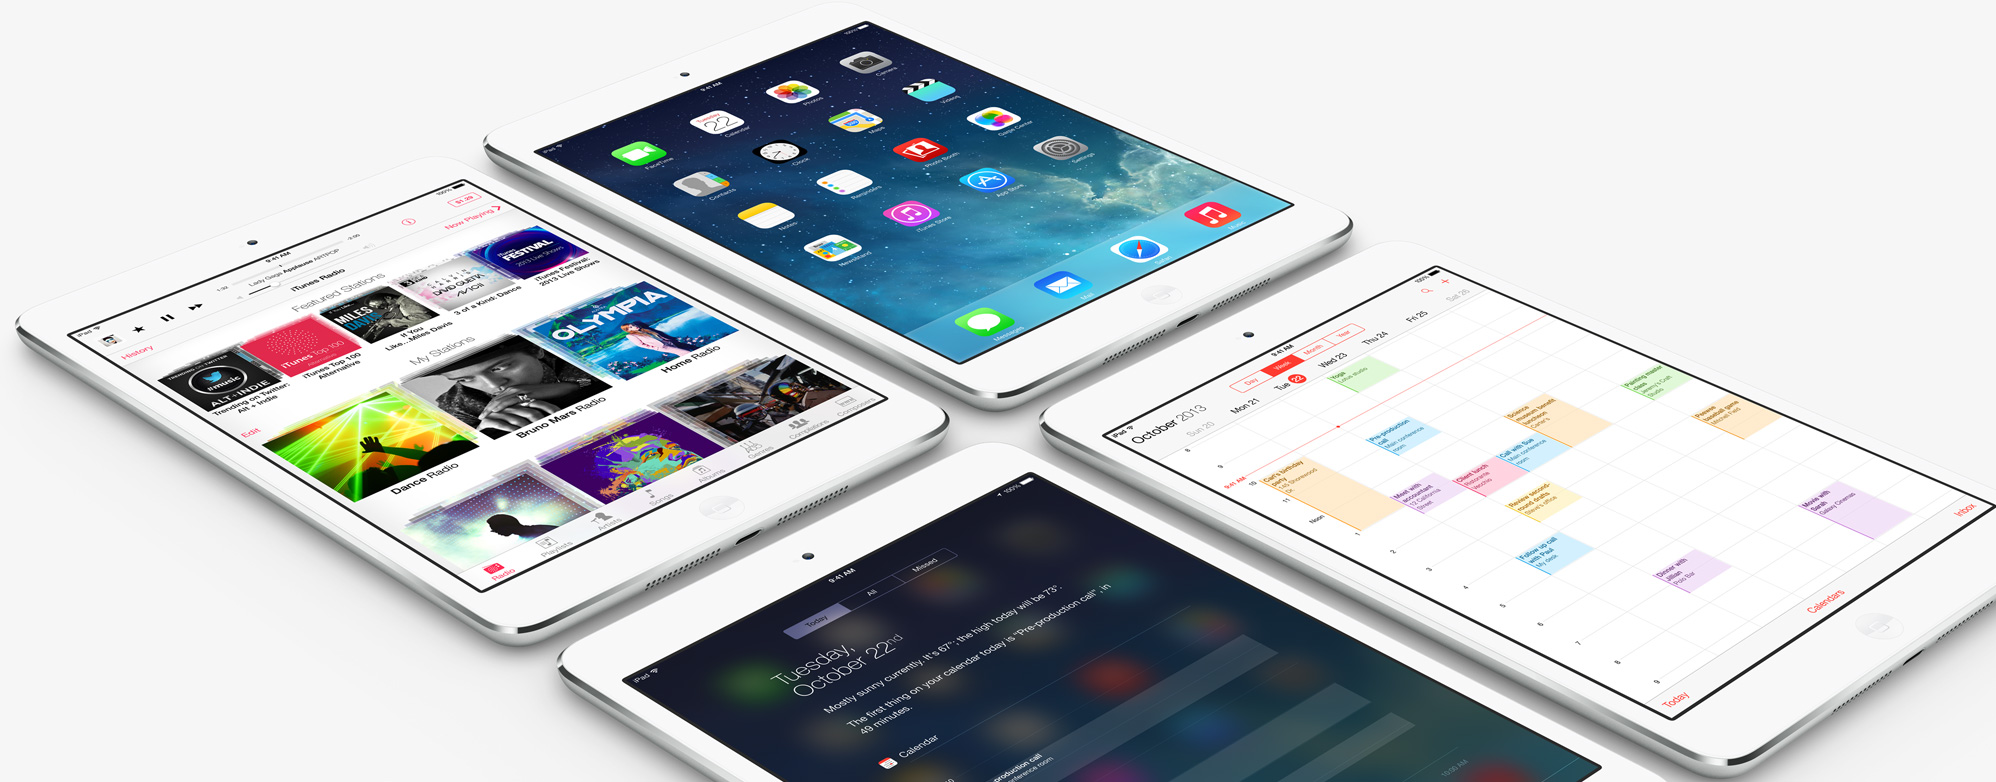 four-iPad-mini-retina-display